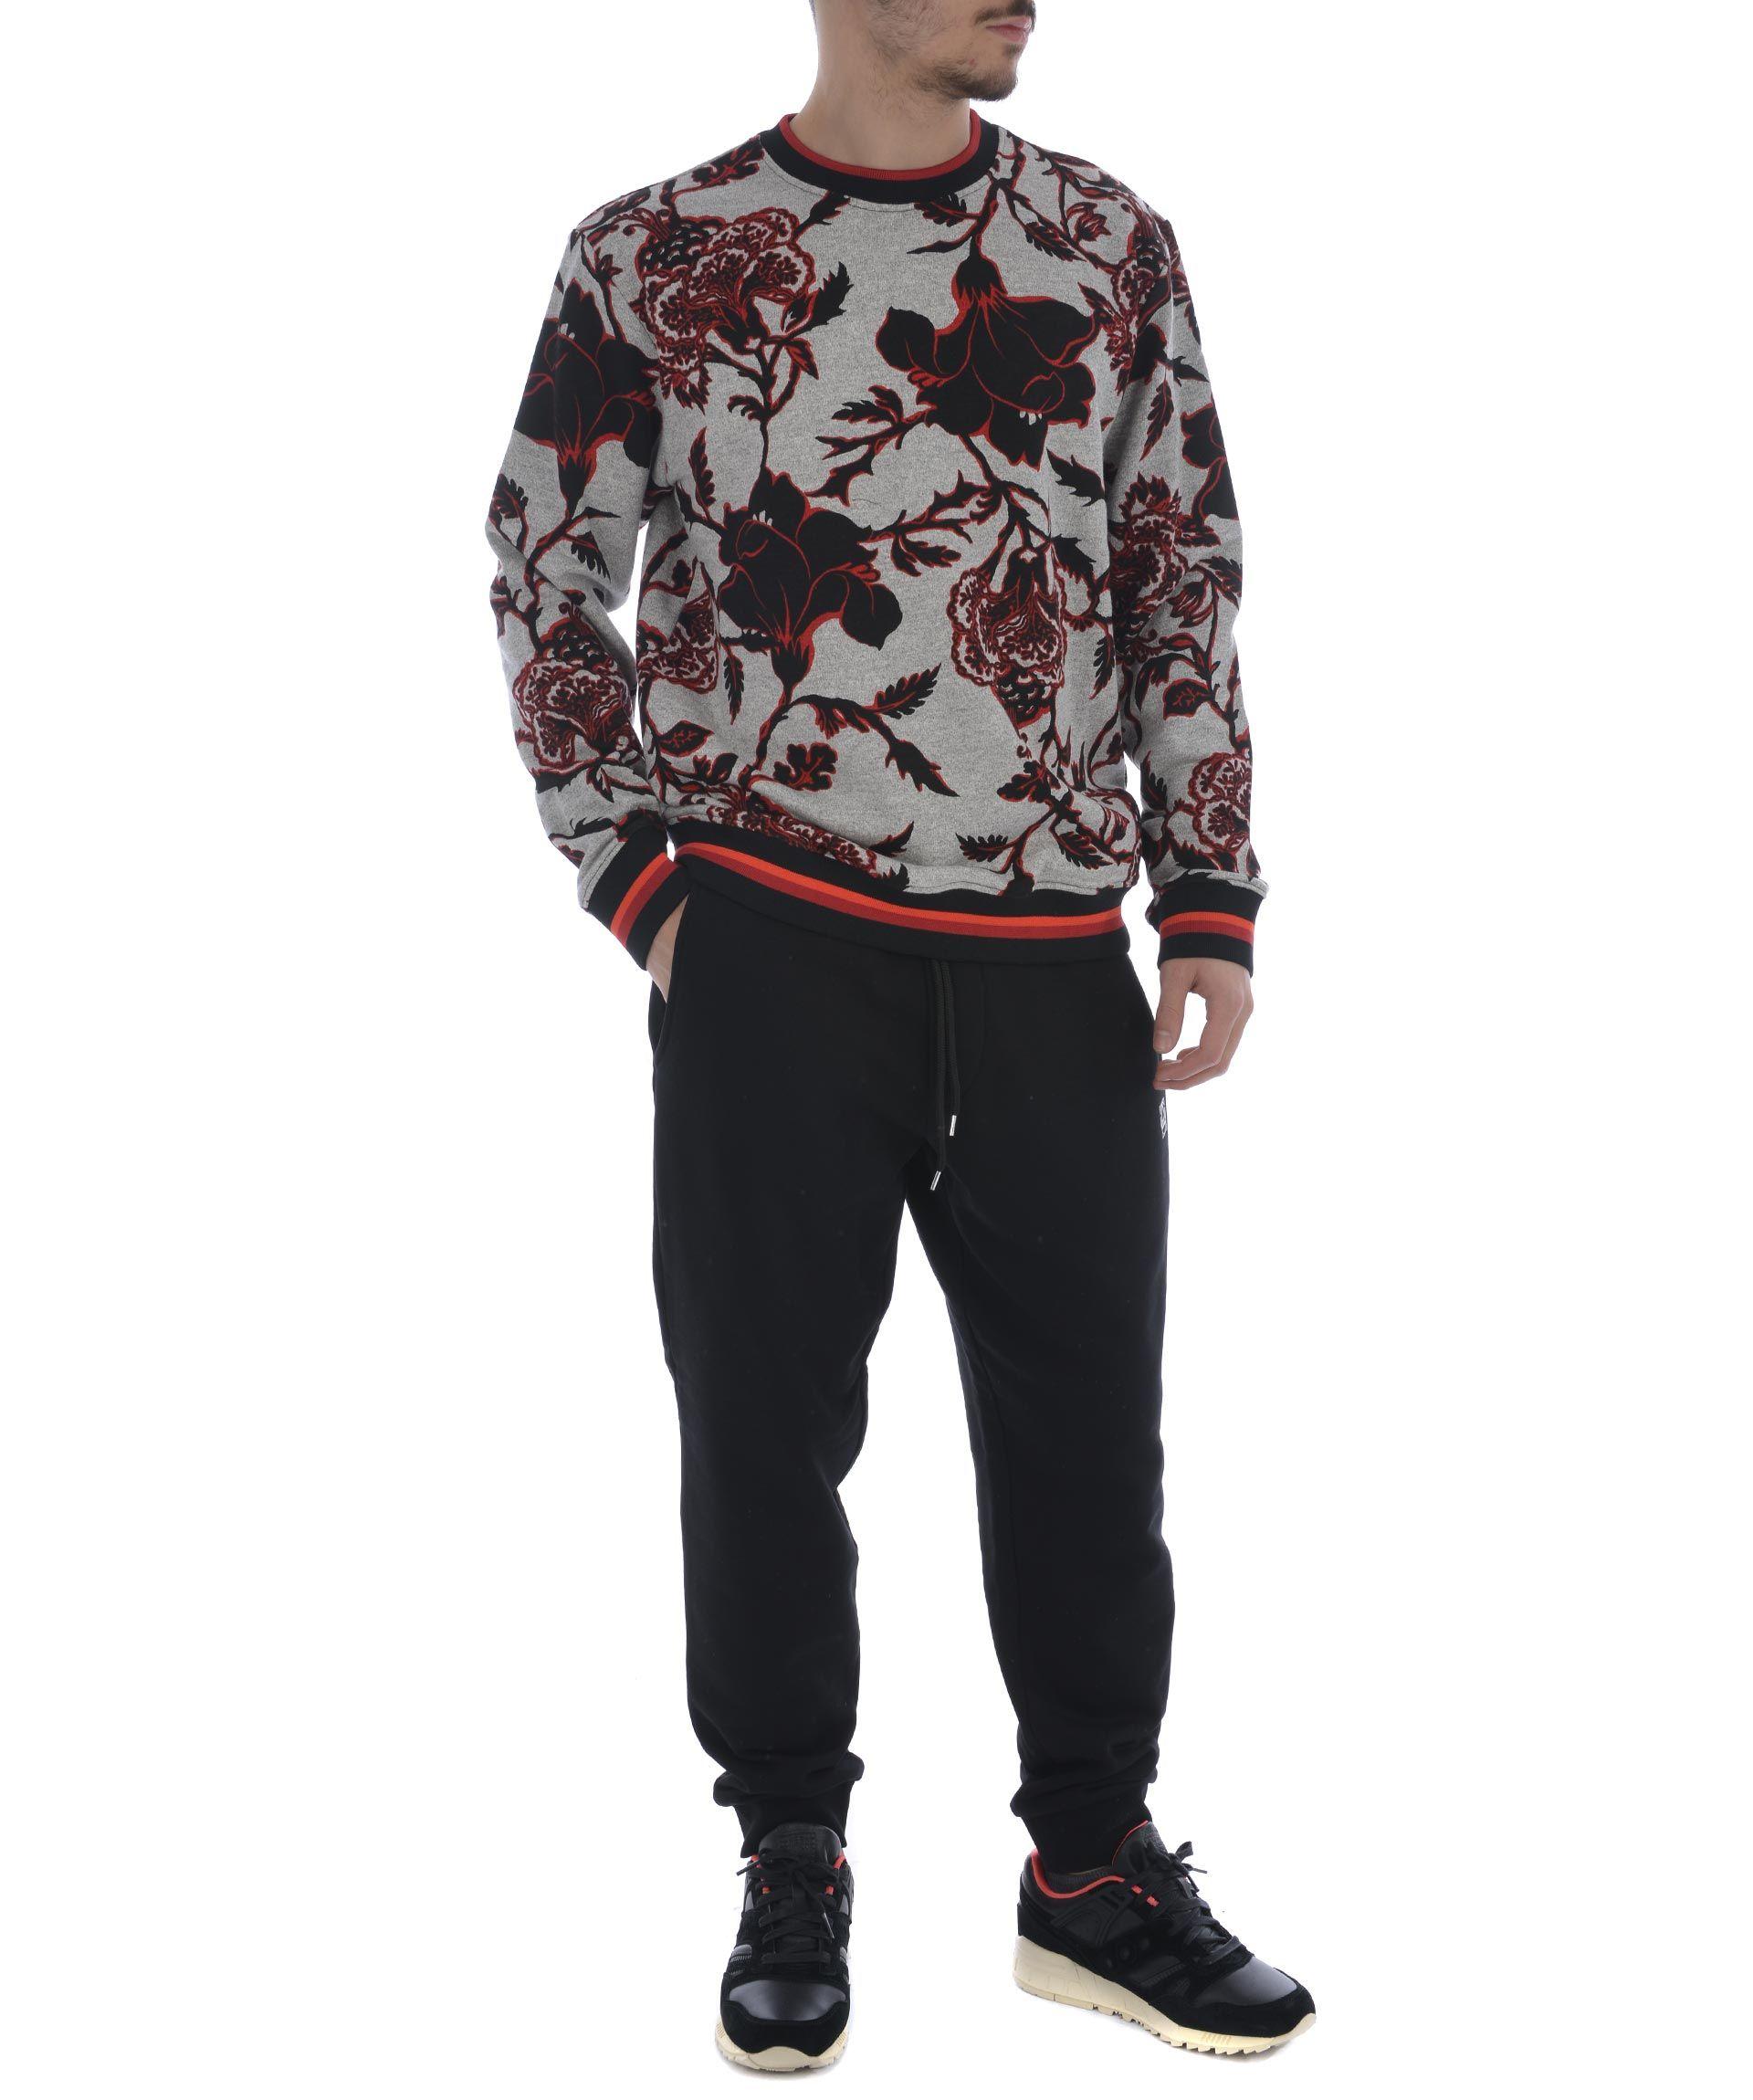 Mcq Alexander Mcqueen Floral Print Sweatshirt